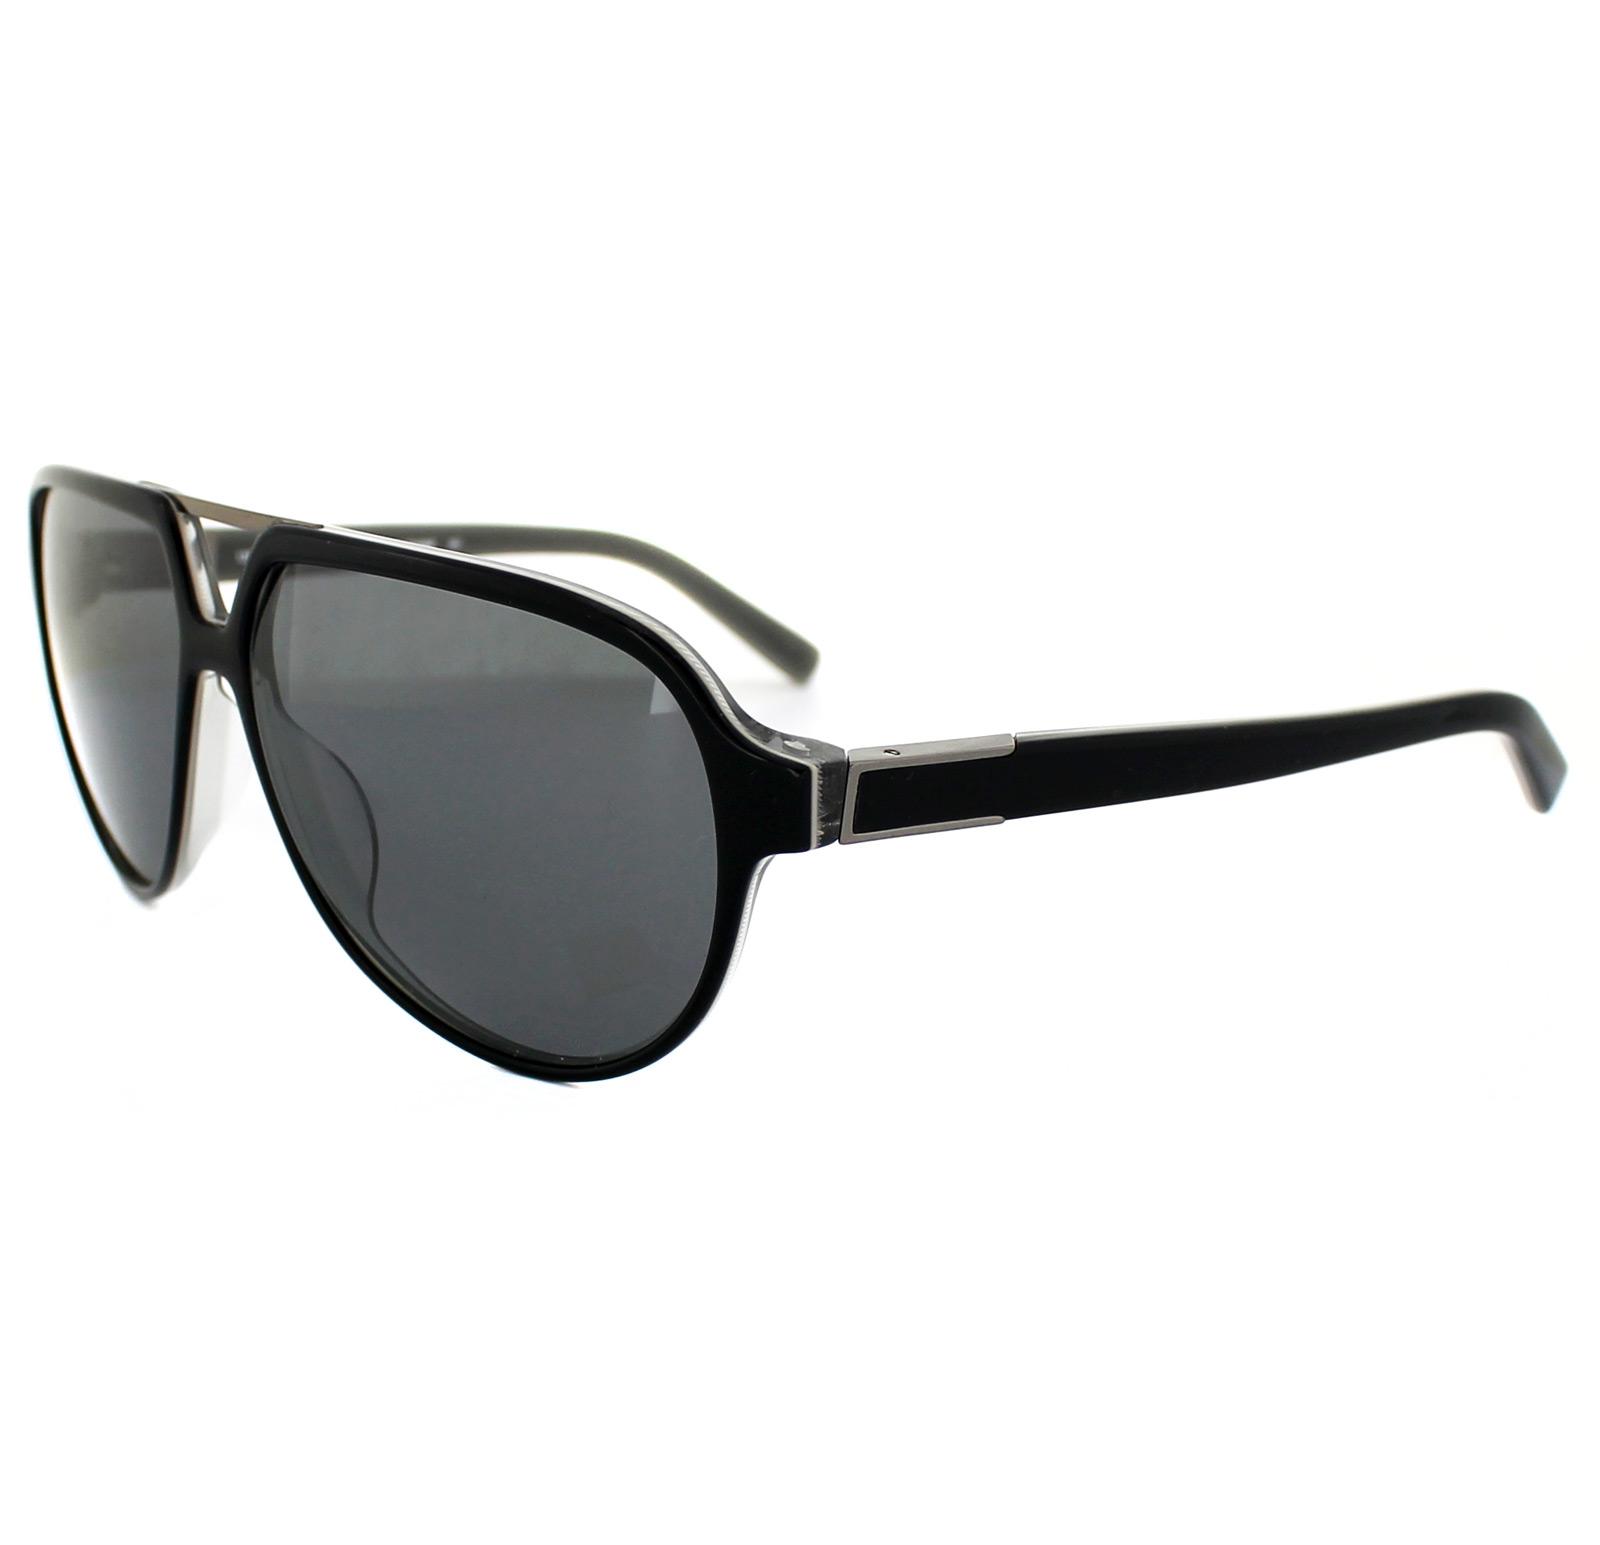 3830c7779a5 Cheap Calvin Klein 7858SP Sunglasses - Discounted Sunglasses